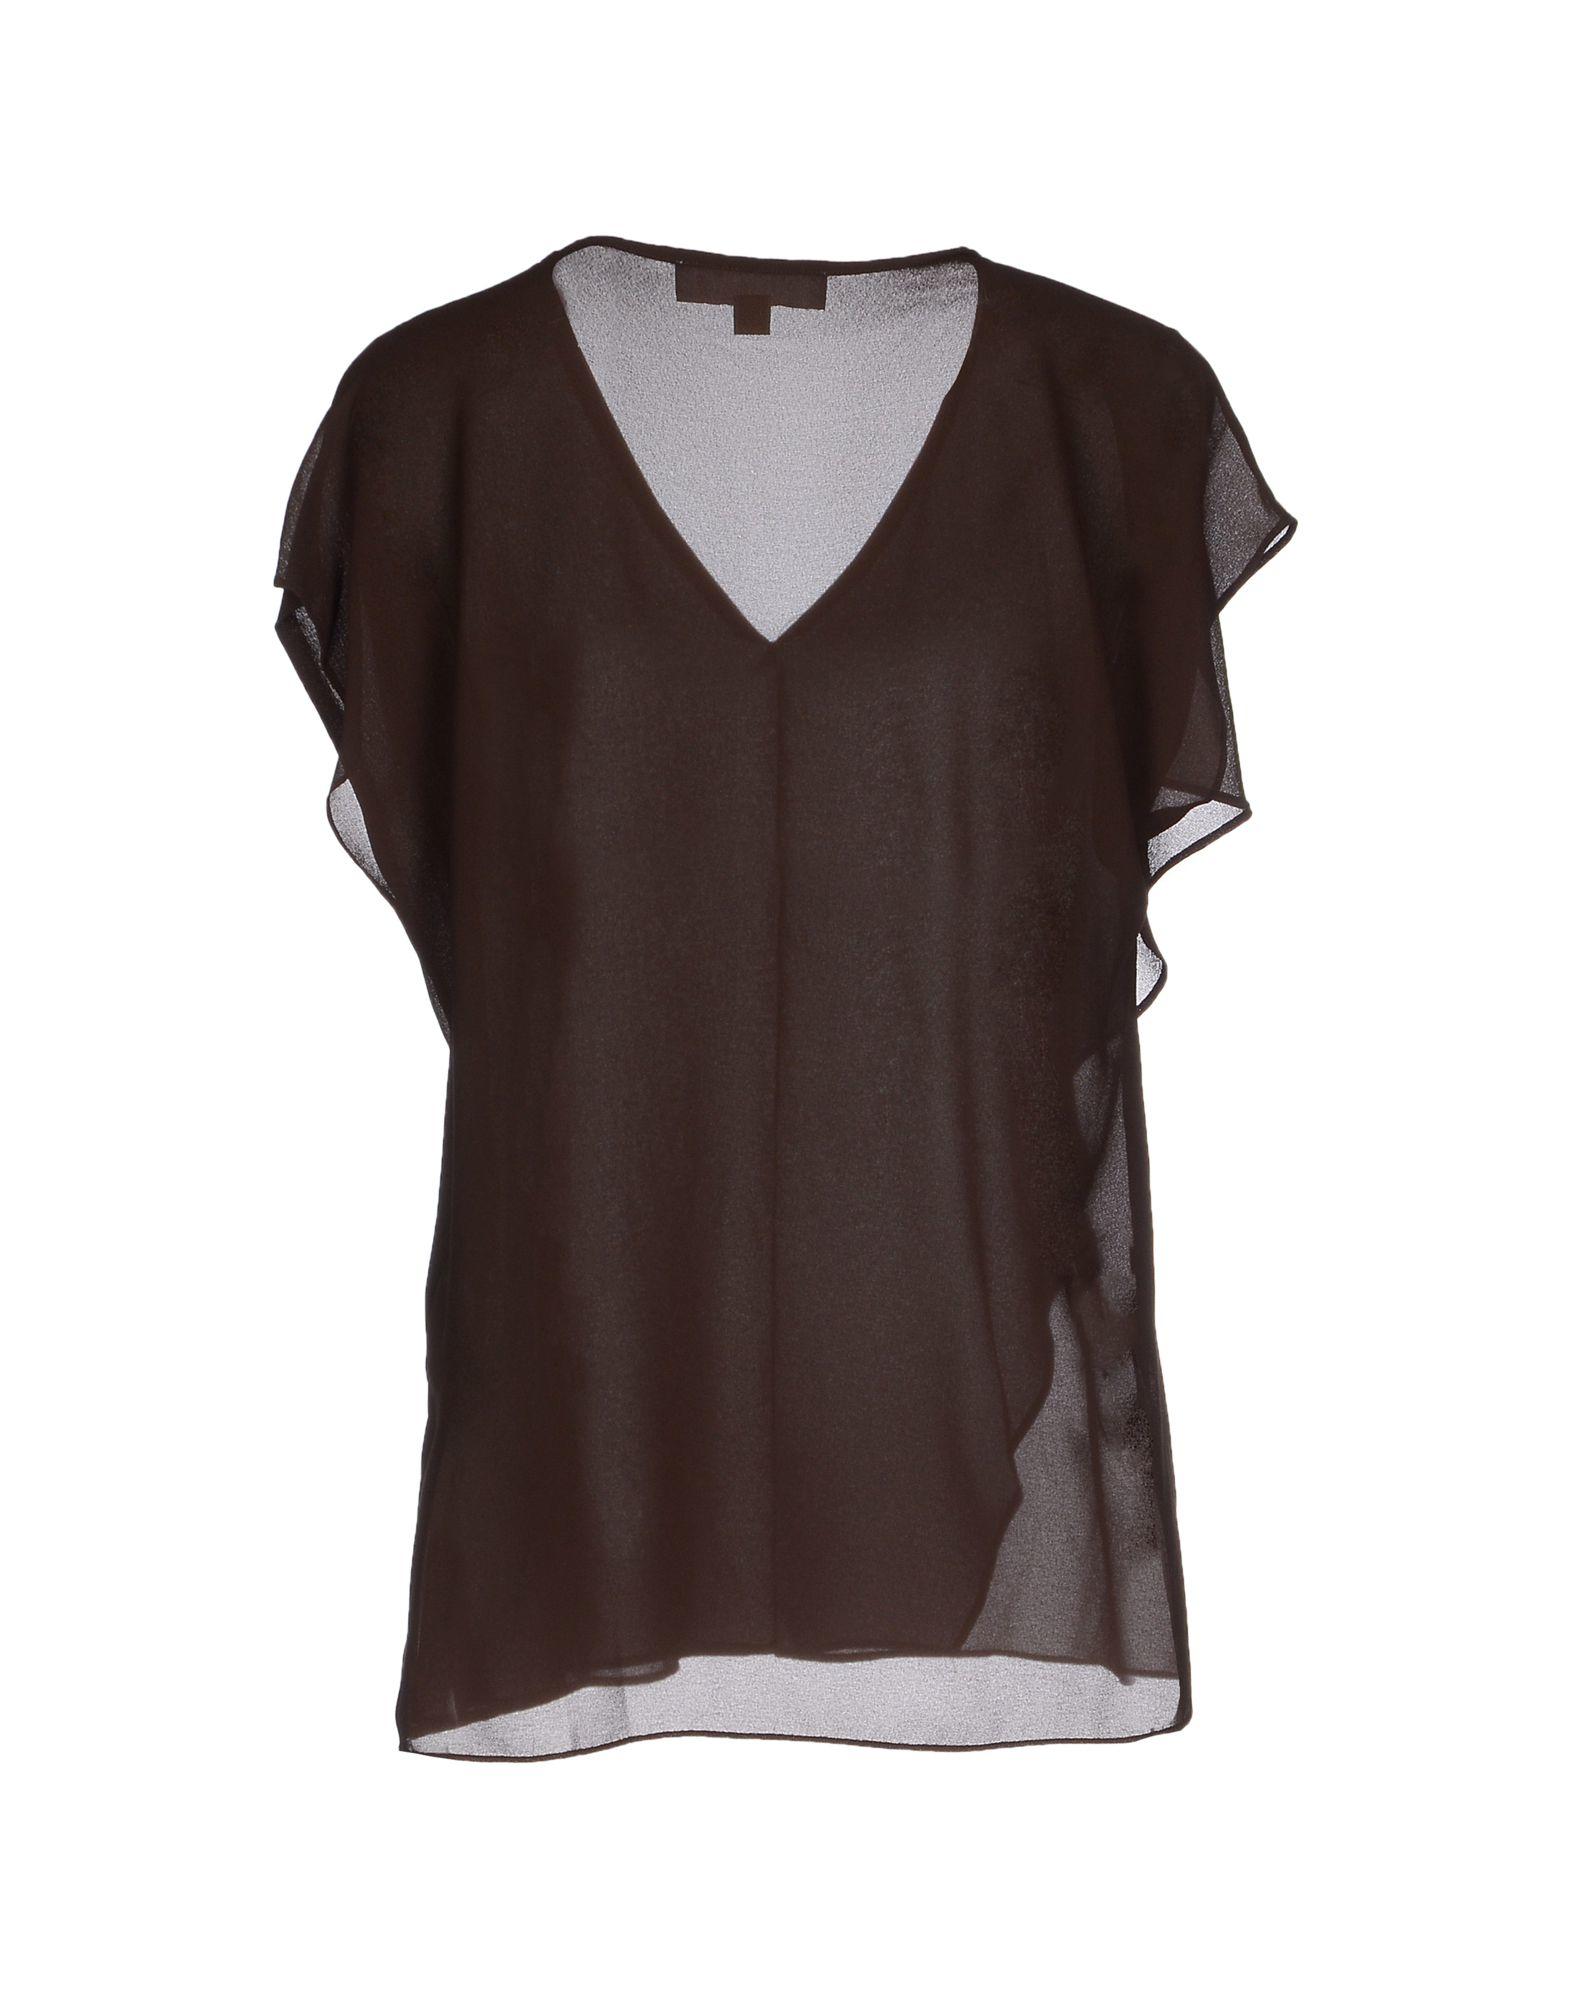 michael michael kors blouse in brown lyst. Black Bedroom Furniture Sets. Home Design Ideas